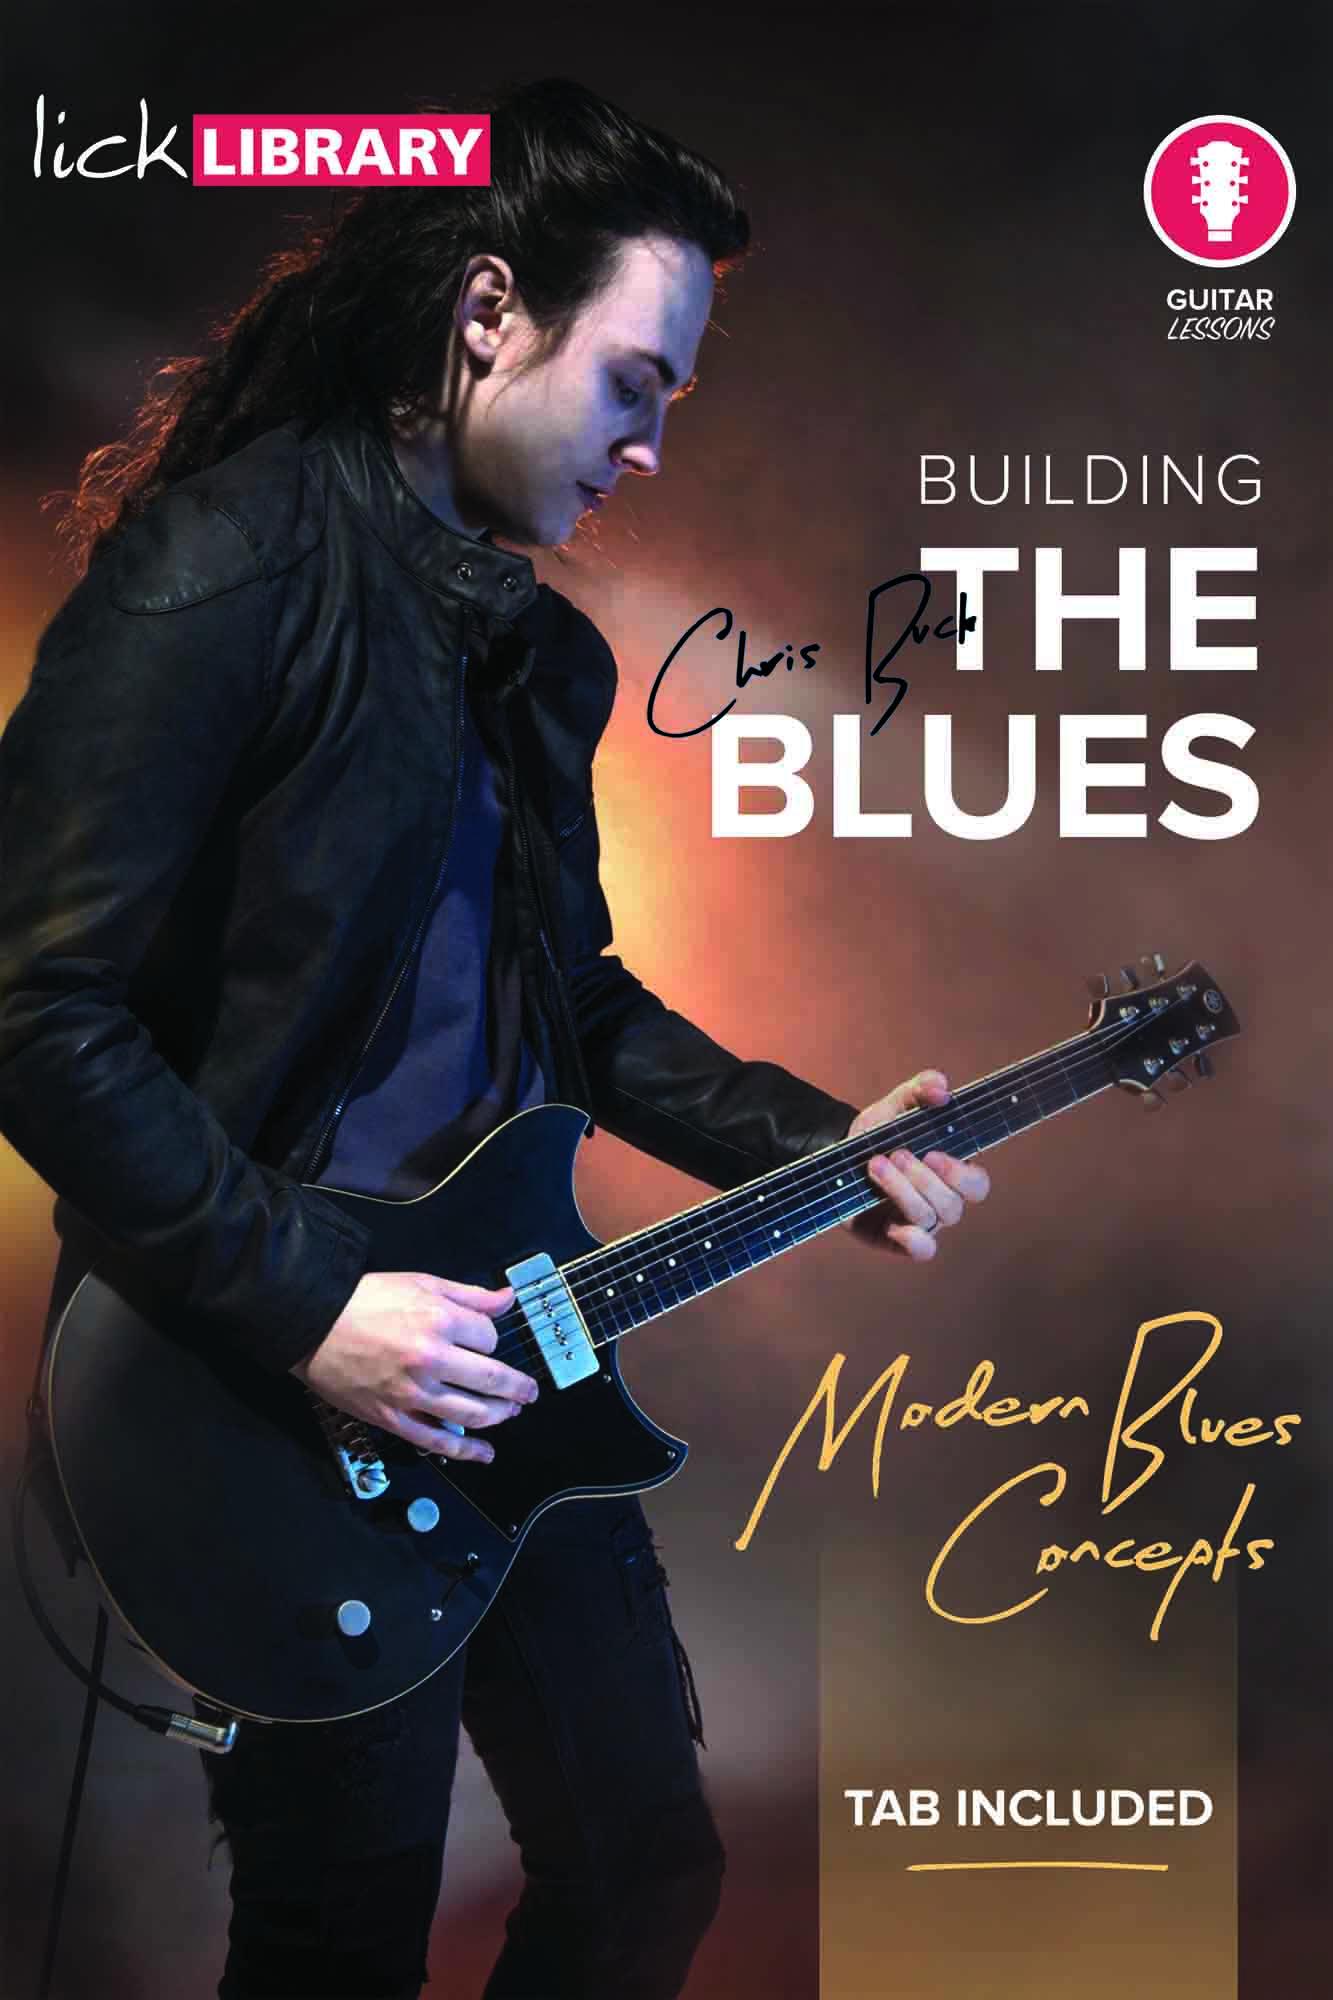 Building The Blues - Modern Blues Concepts